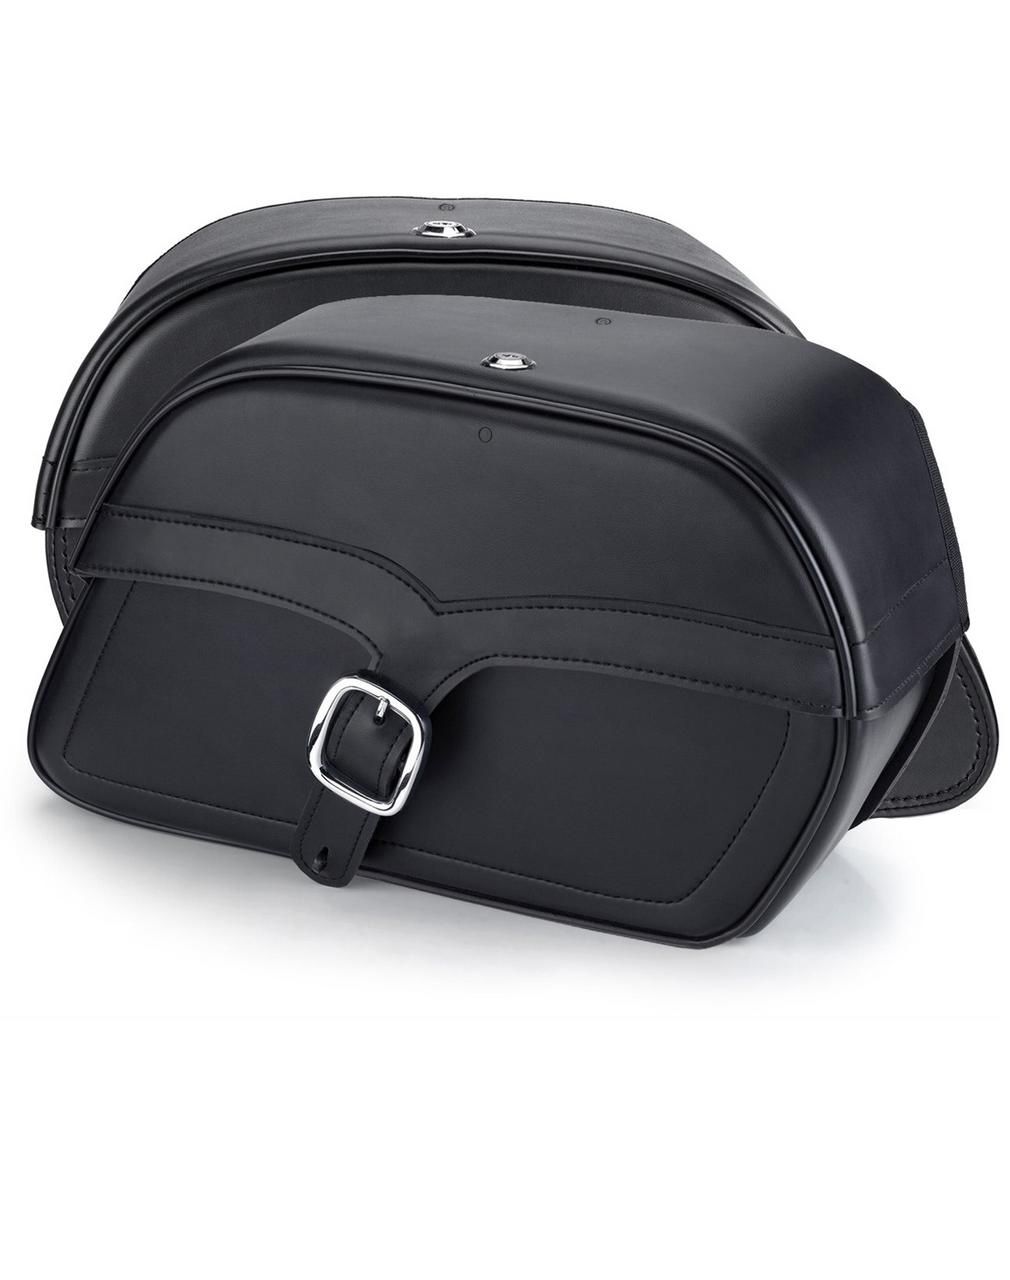 Honda VTX 1800 N Charger Single Strap Large Motorcycle Saddlebags Both Bags View